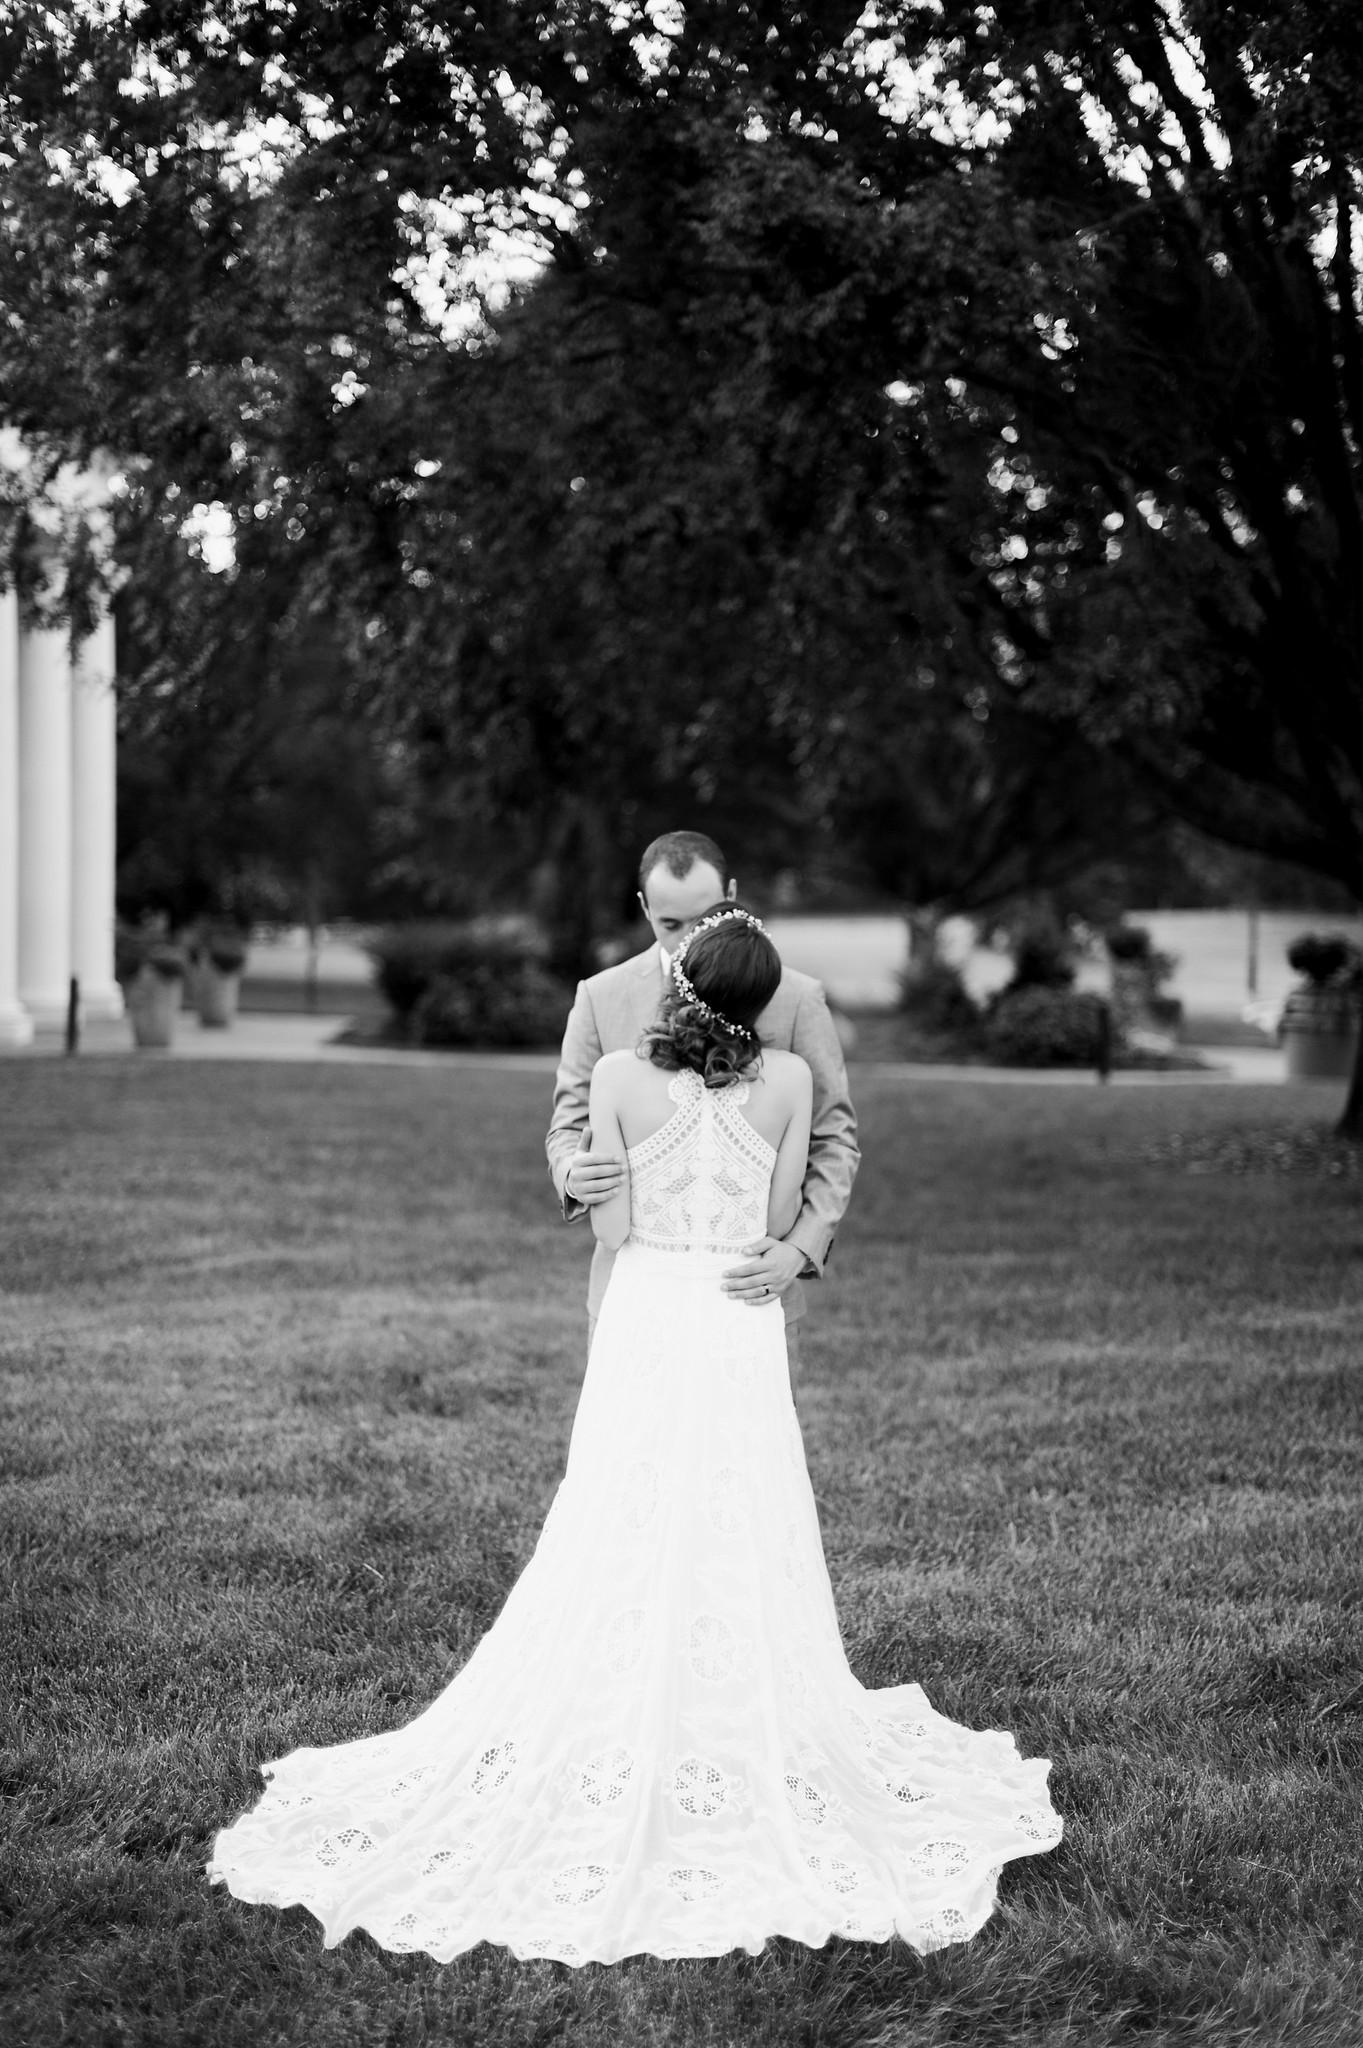 thomas-wedding-349-X4.jpg